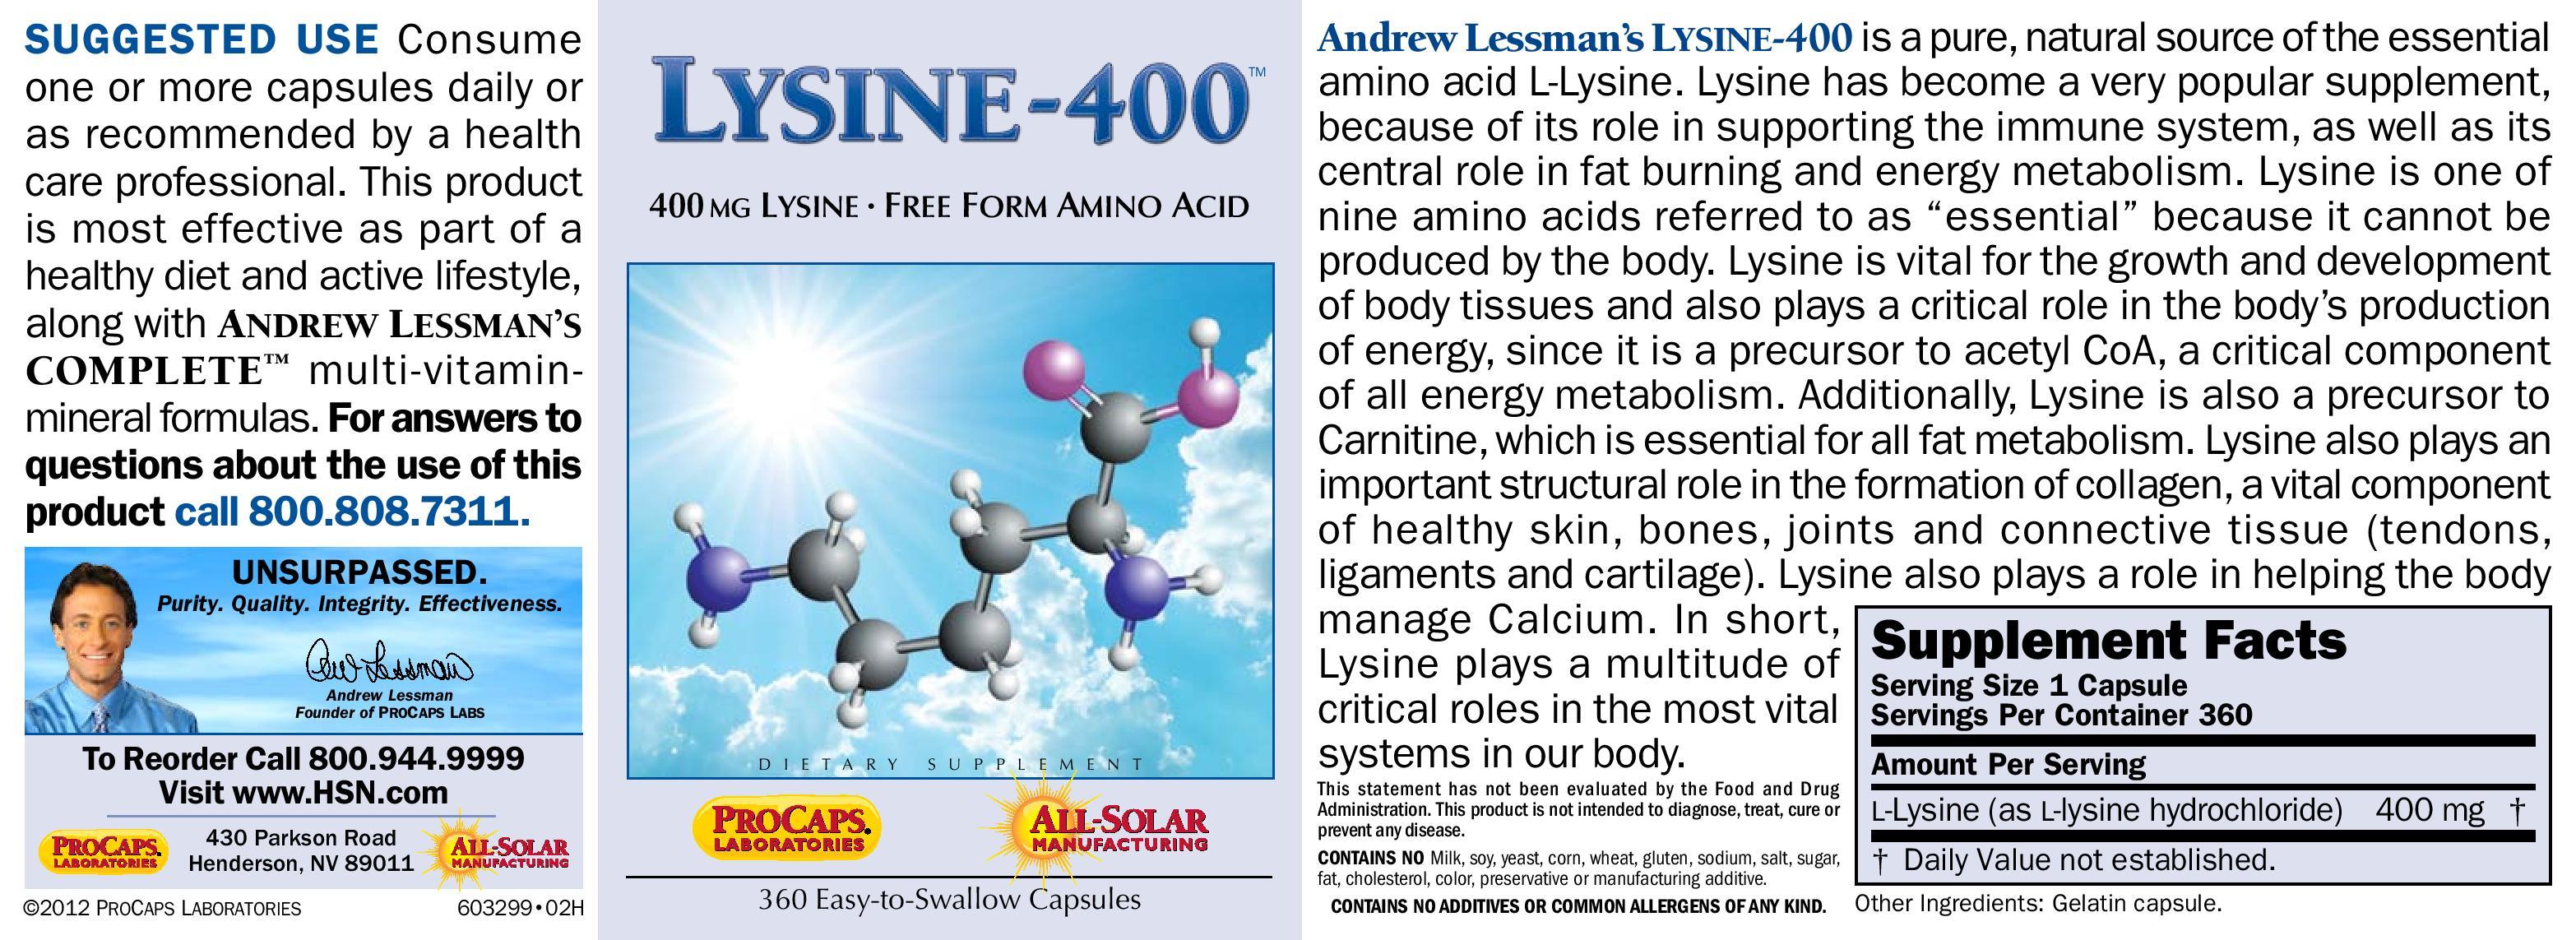 Benefits of taking lysine : Top secret ultra